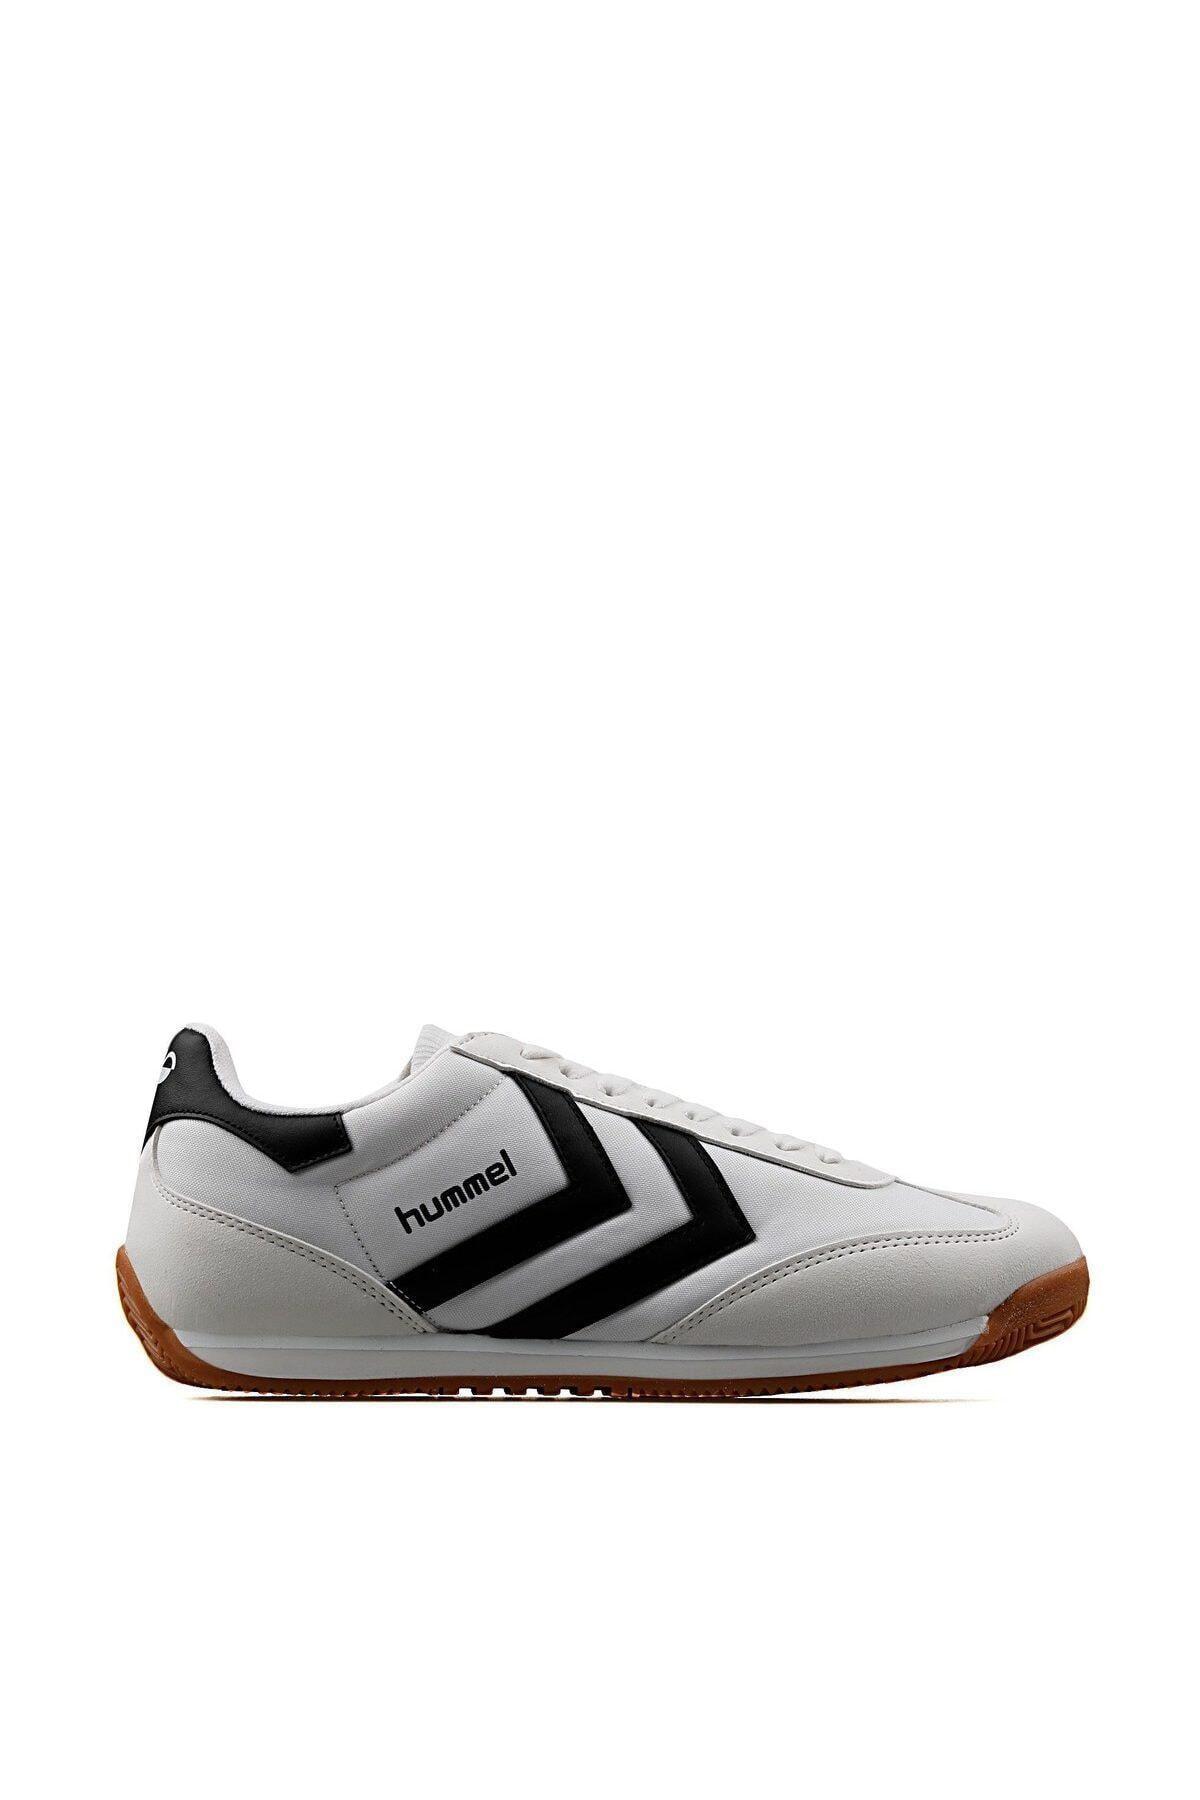 HUMMEL STADION III LIFESTYLE SHO Beyaz Erkek Sneaker Ayakkabı 100584580 1